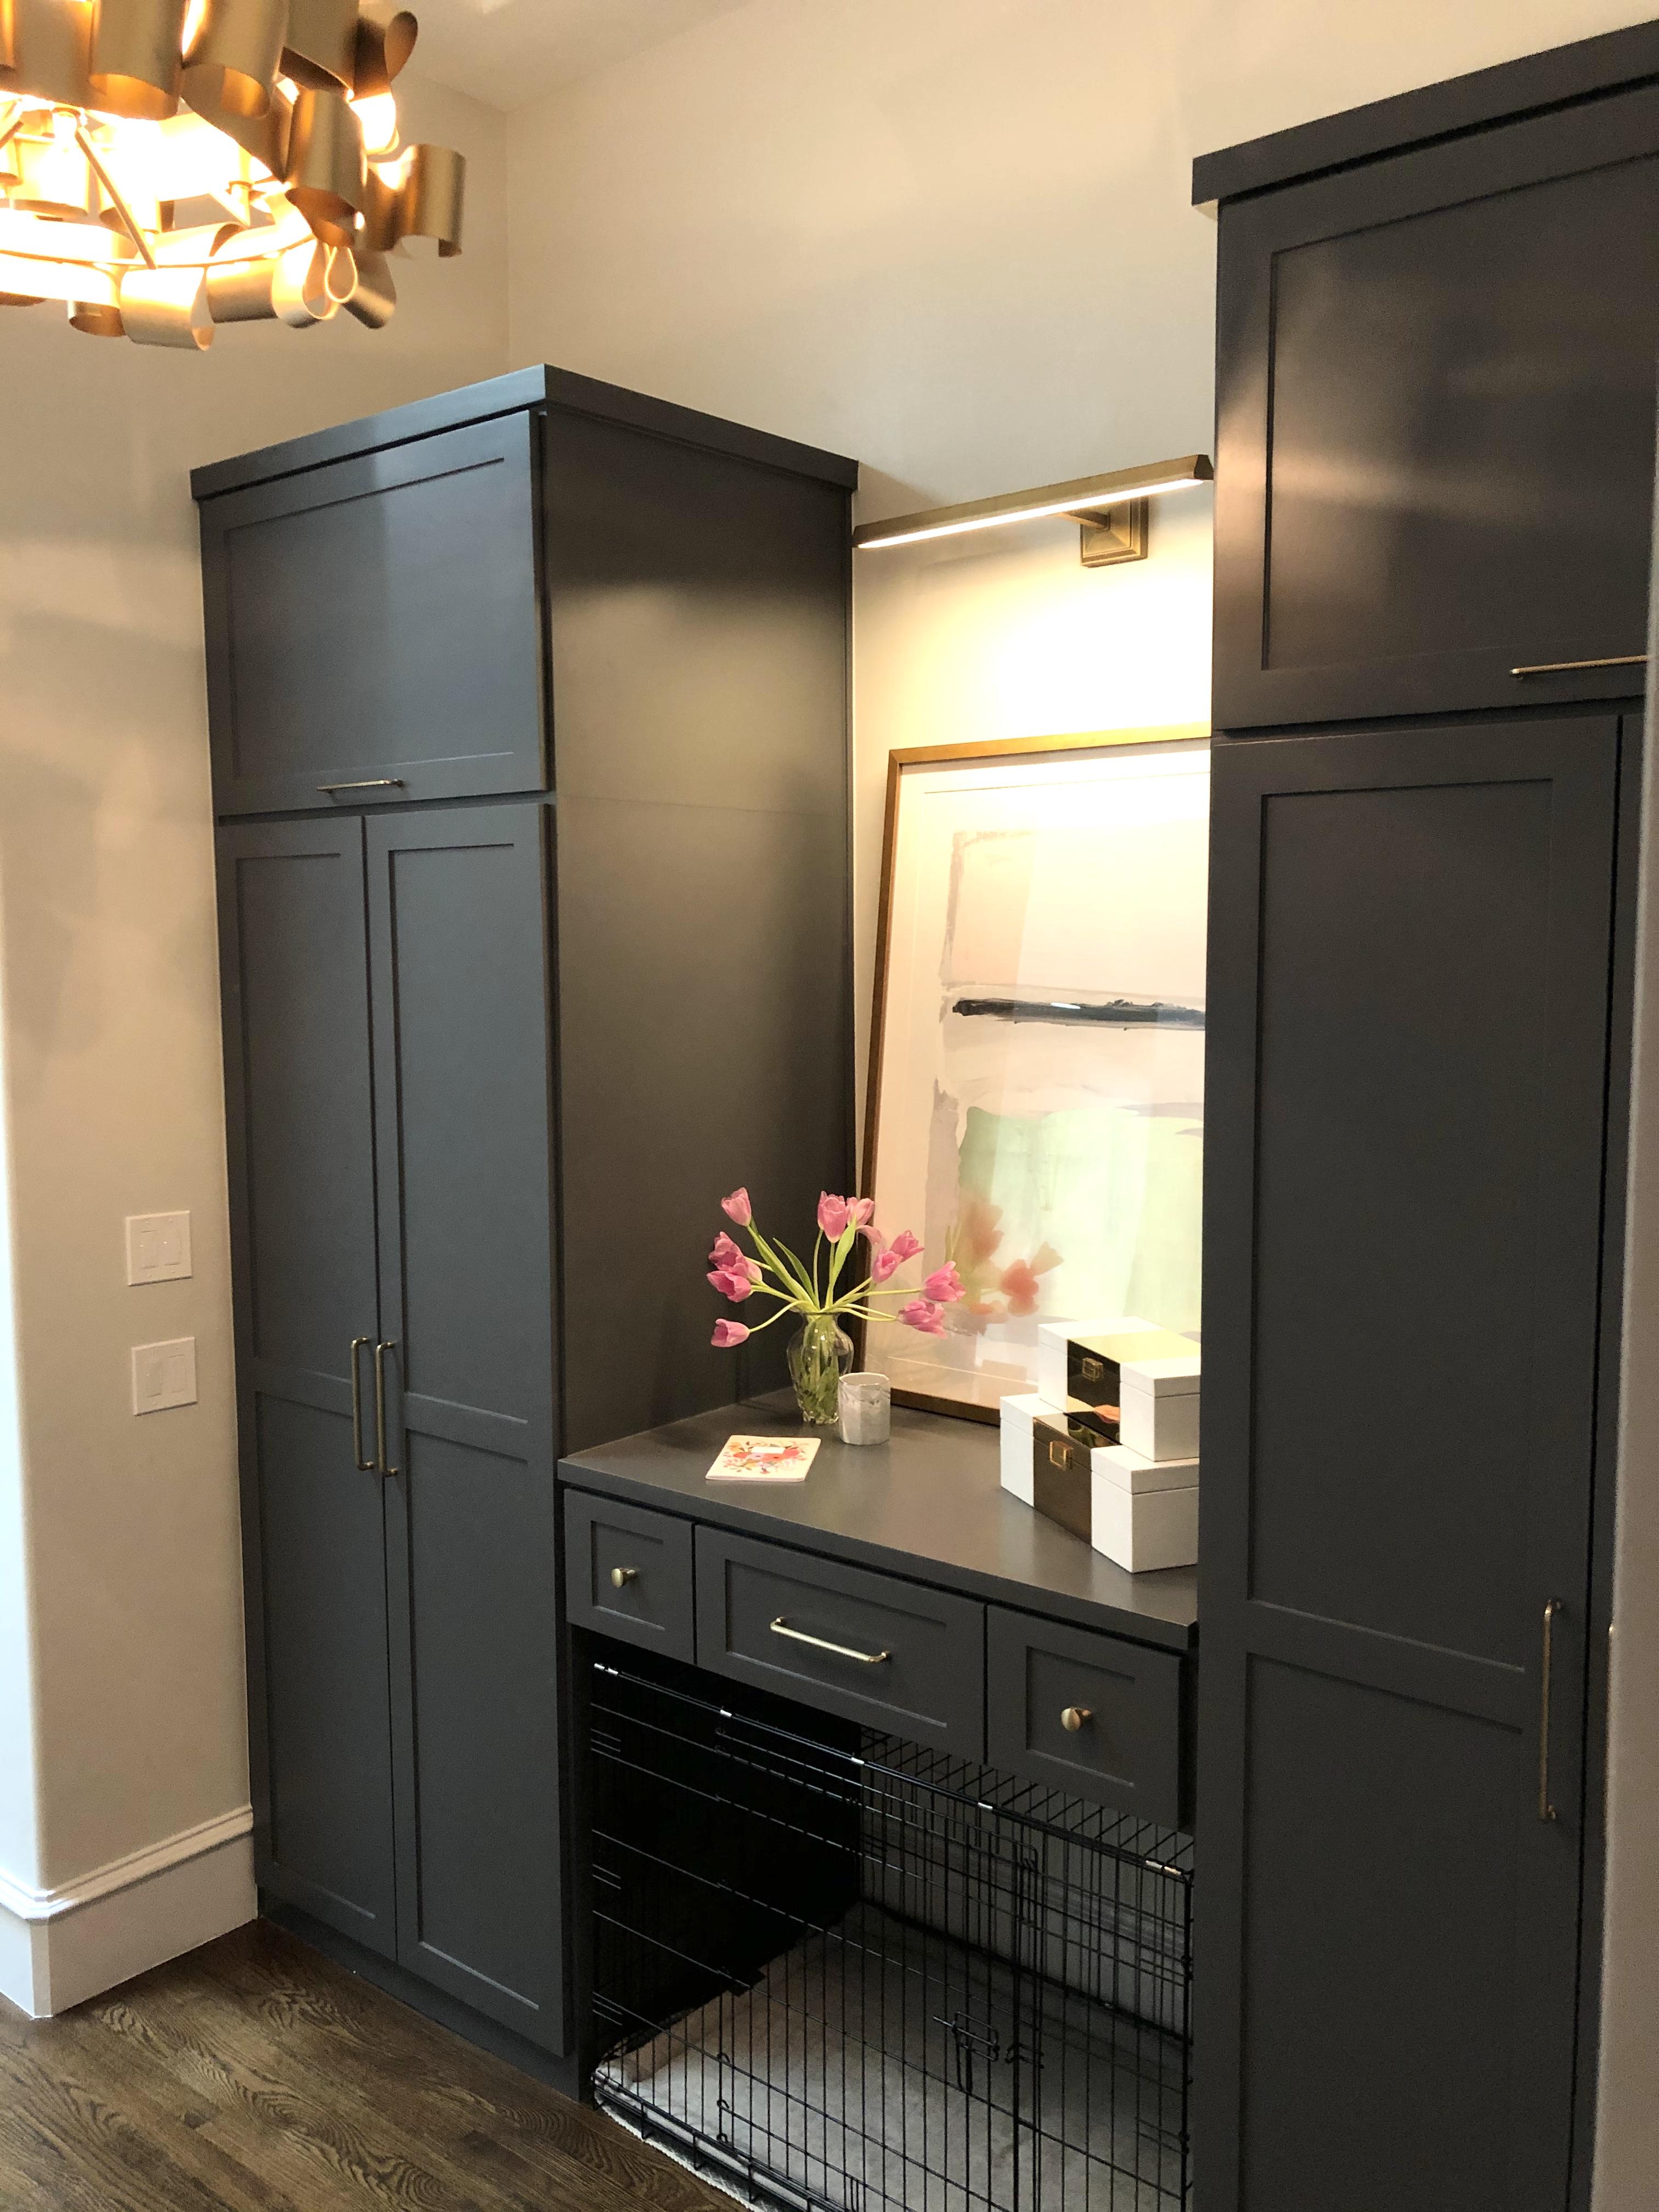 Built in dog kennel cabinet